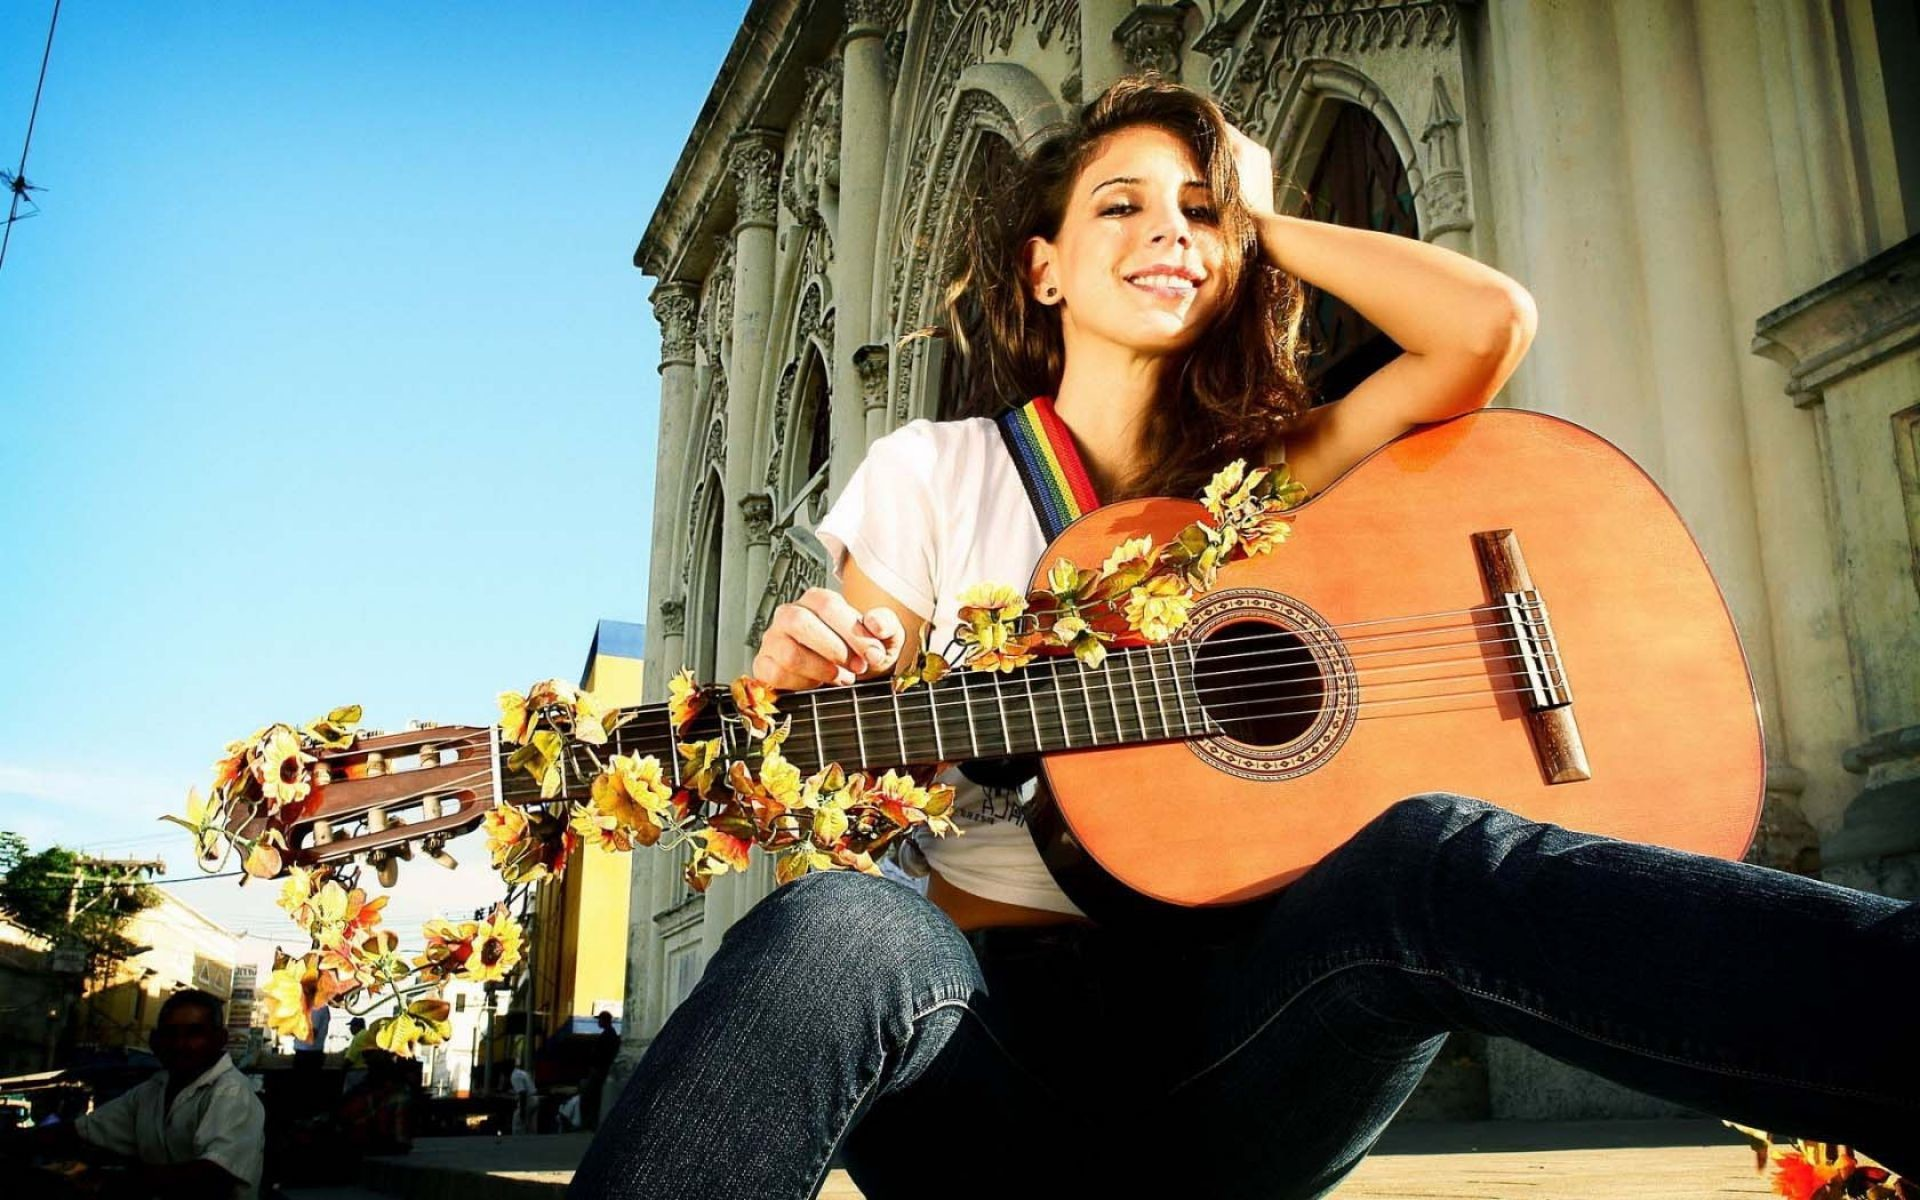 Guitar Girls Wallpaper 76 Images